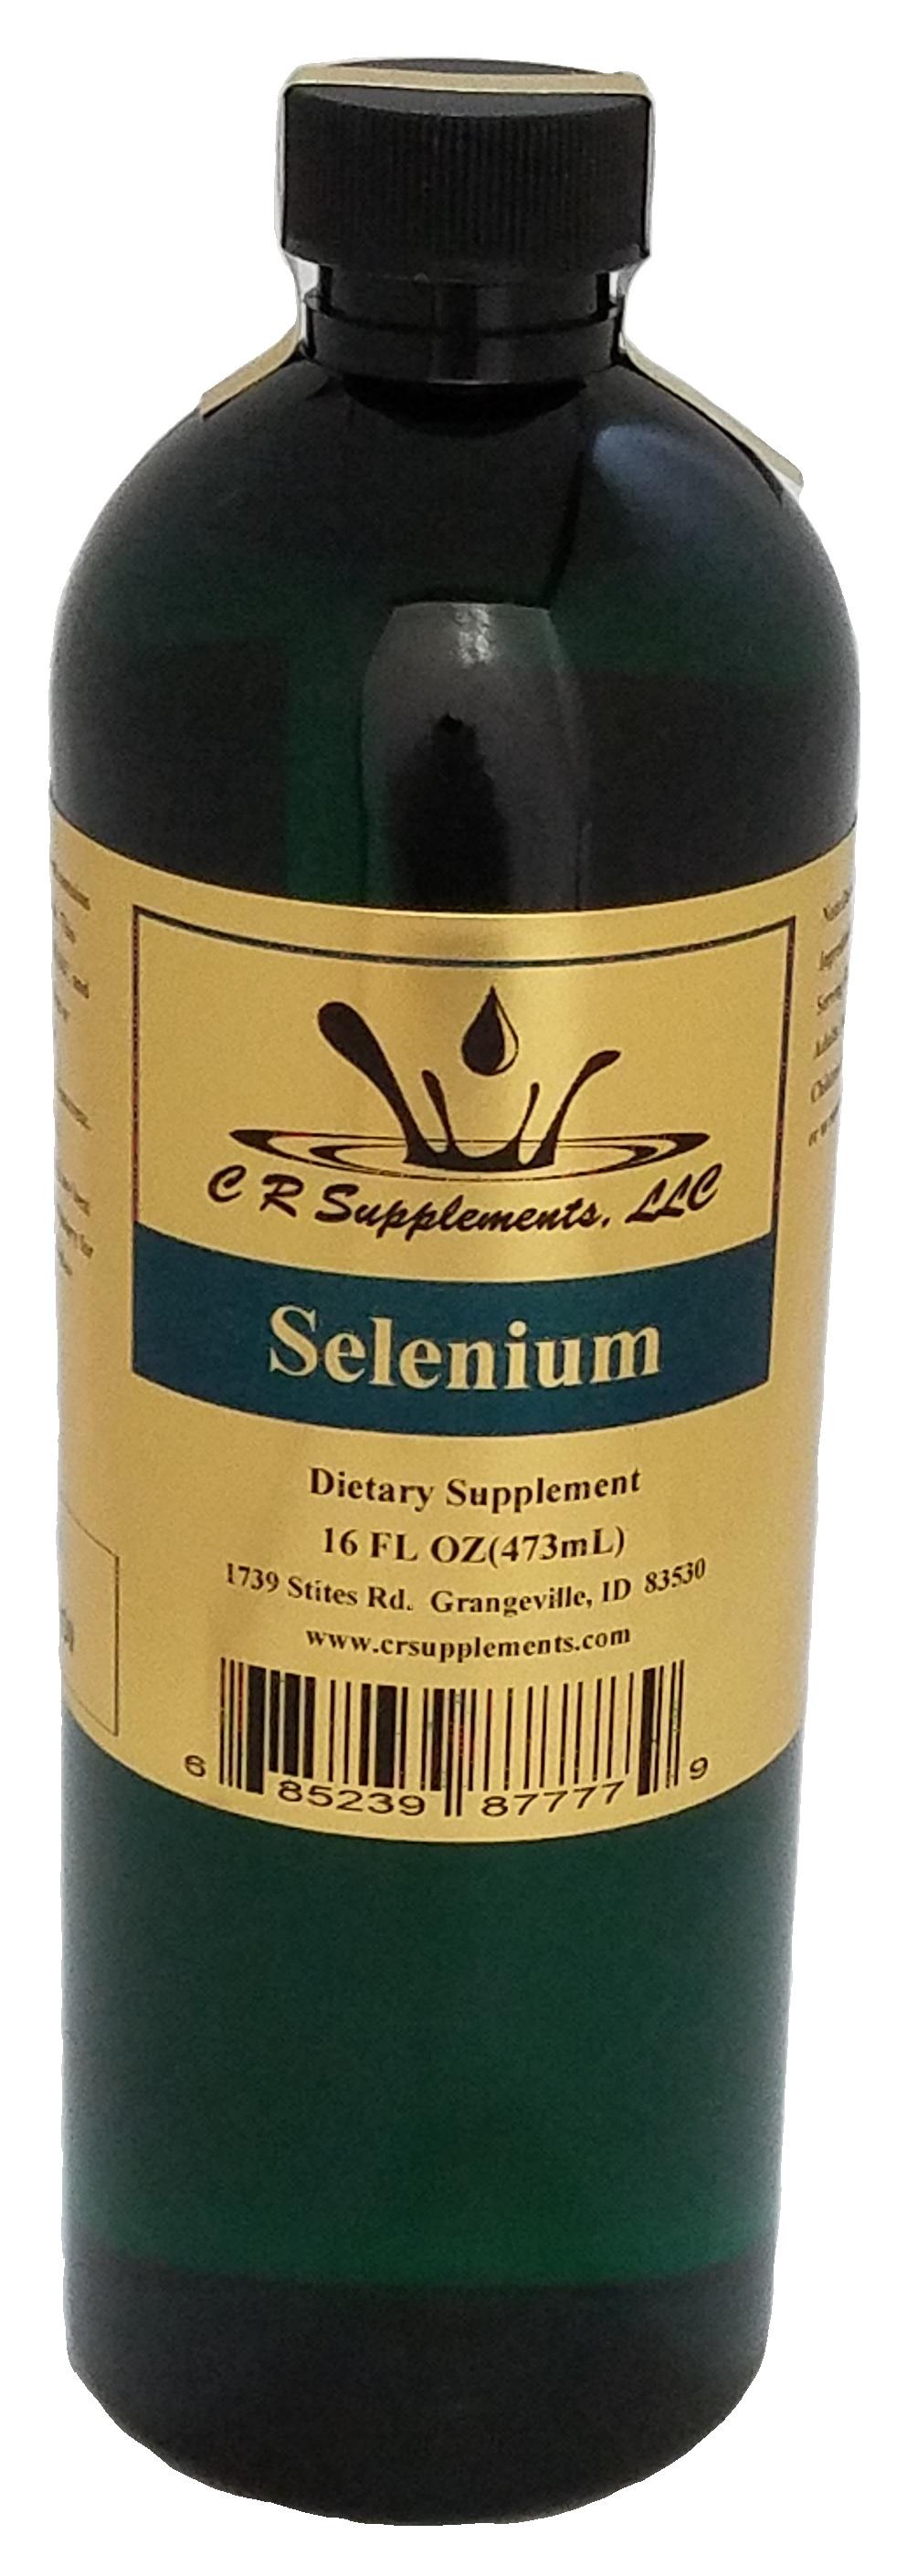 Selenium Dietary Supplement